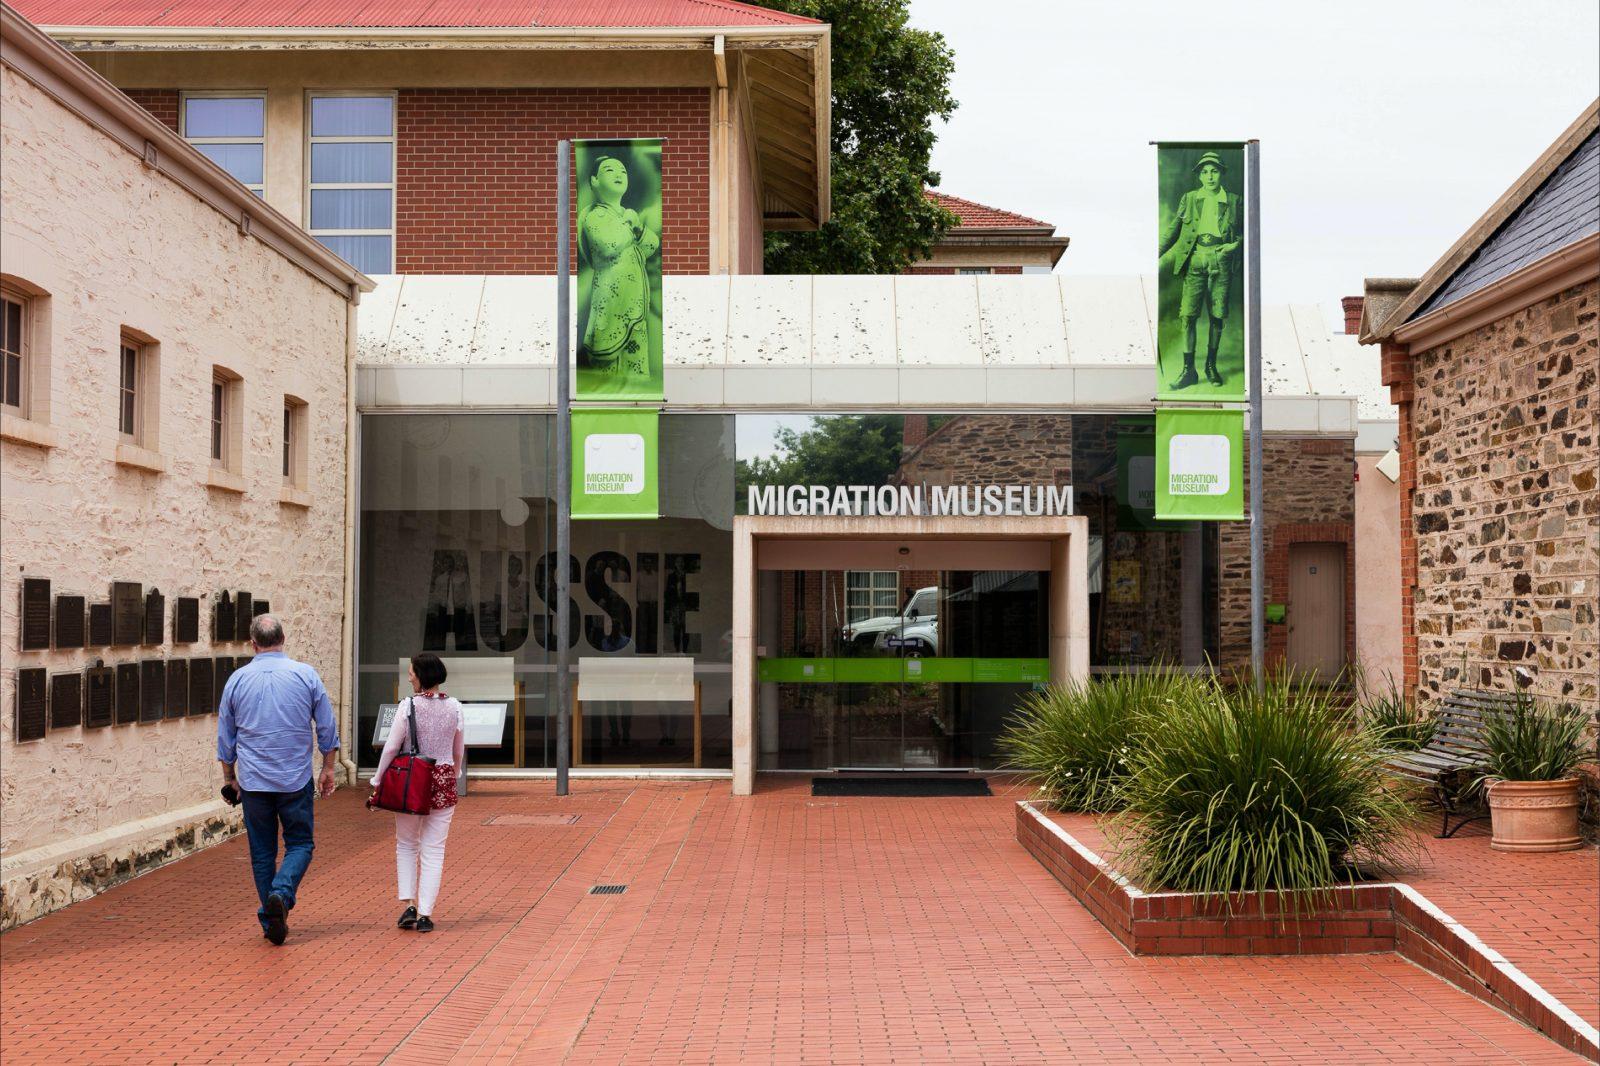 Migration Museum